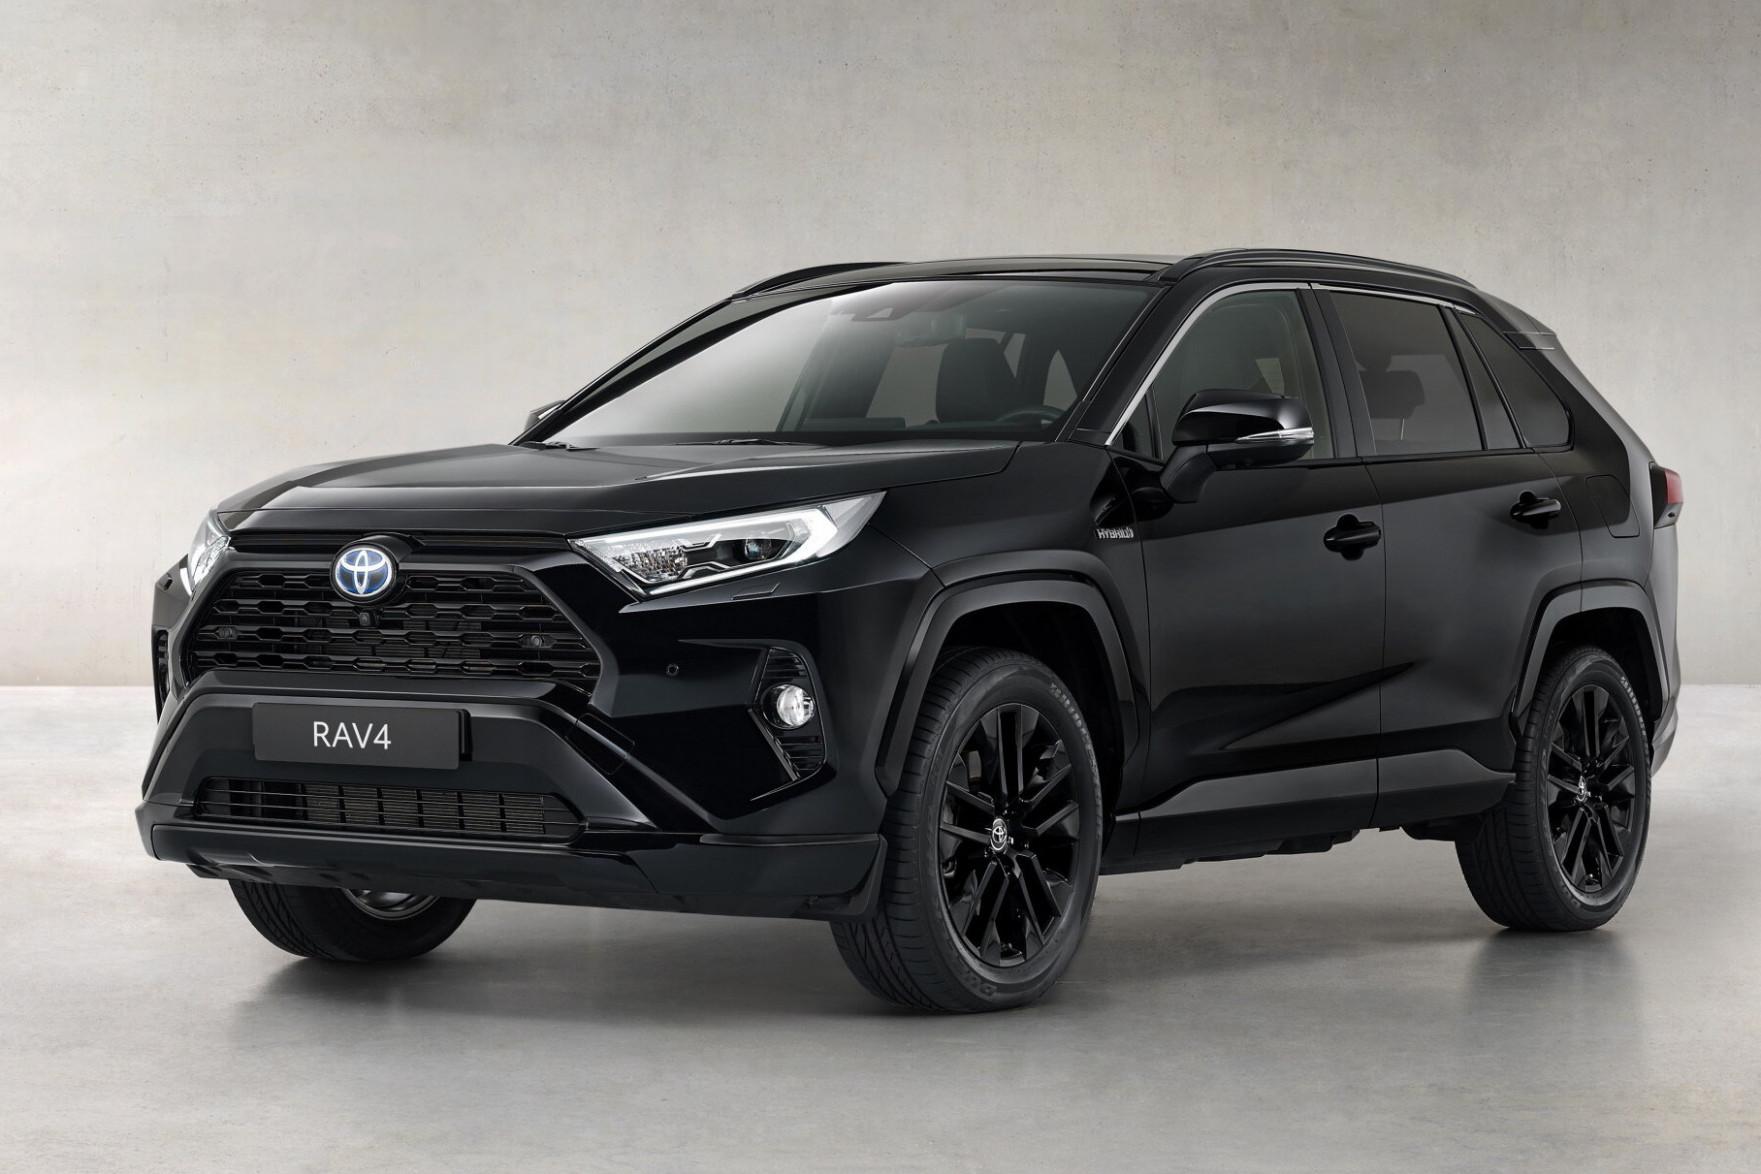 New Model and Performance 2022 Toyota Rav4 Hybrid